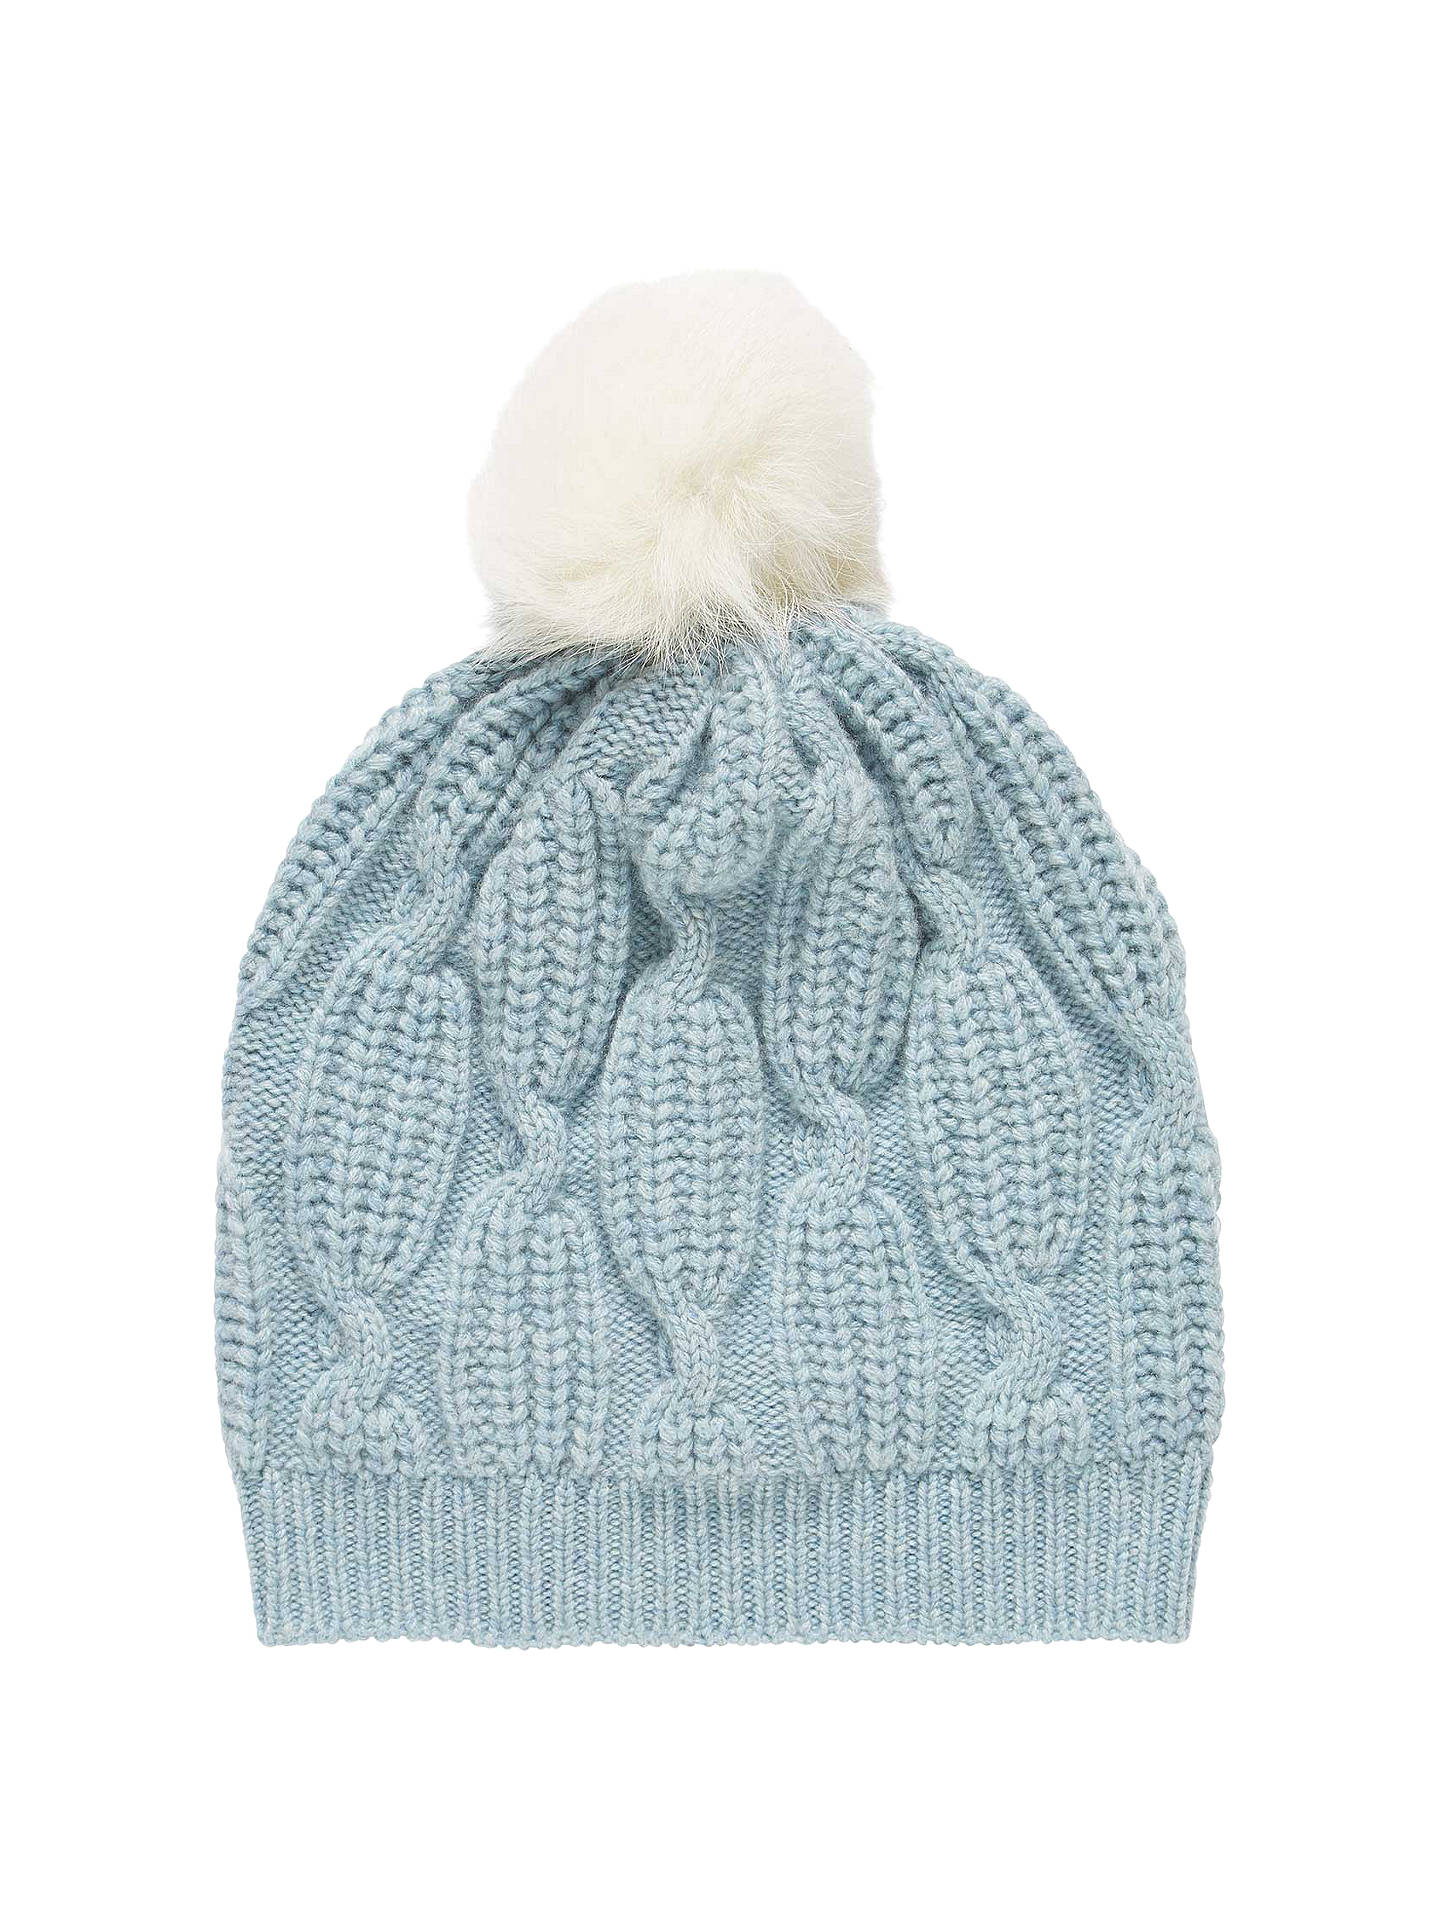 b03a59629d63b1 Buy Brora Cashmere And Sheepskin Beanie Hat, Haar Online at johnlewis.com  ...